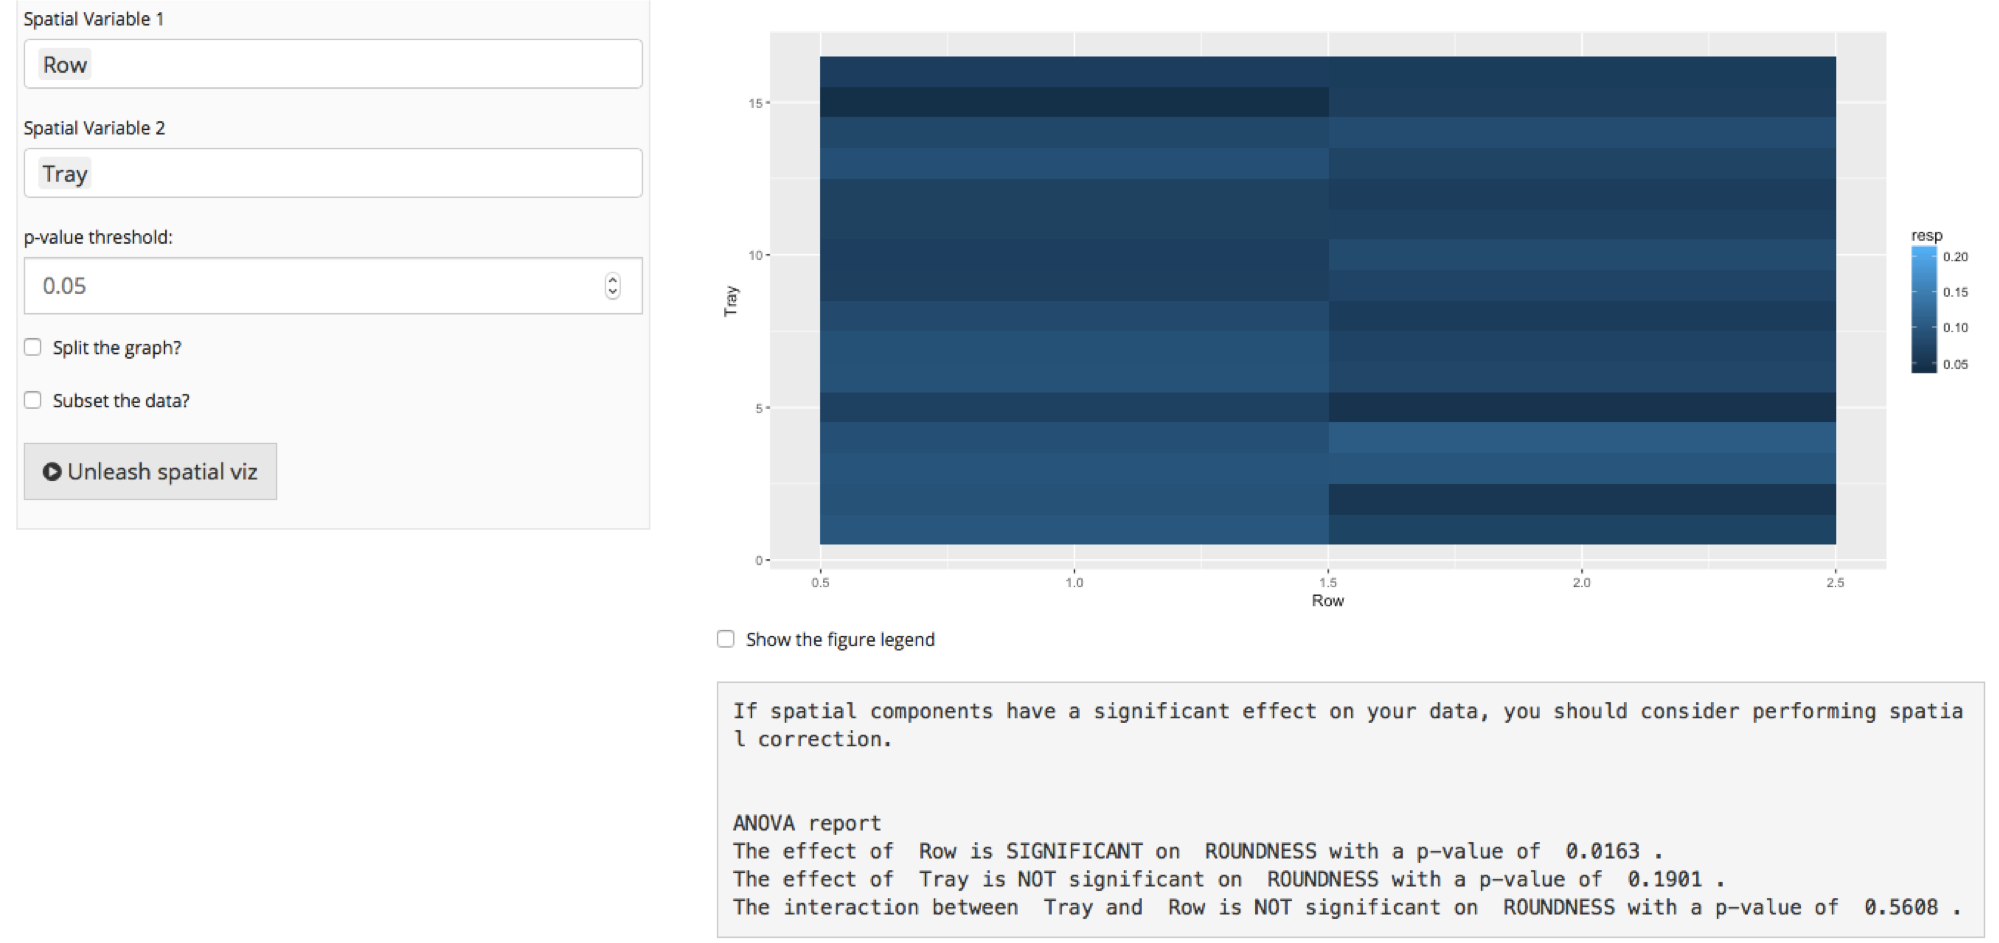 spatial_datatest